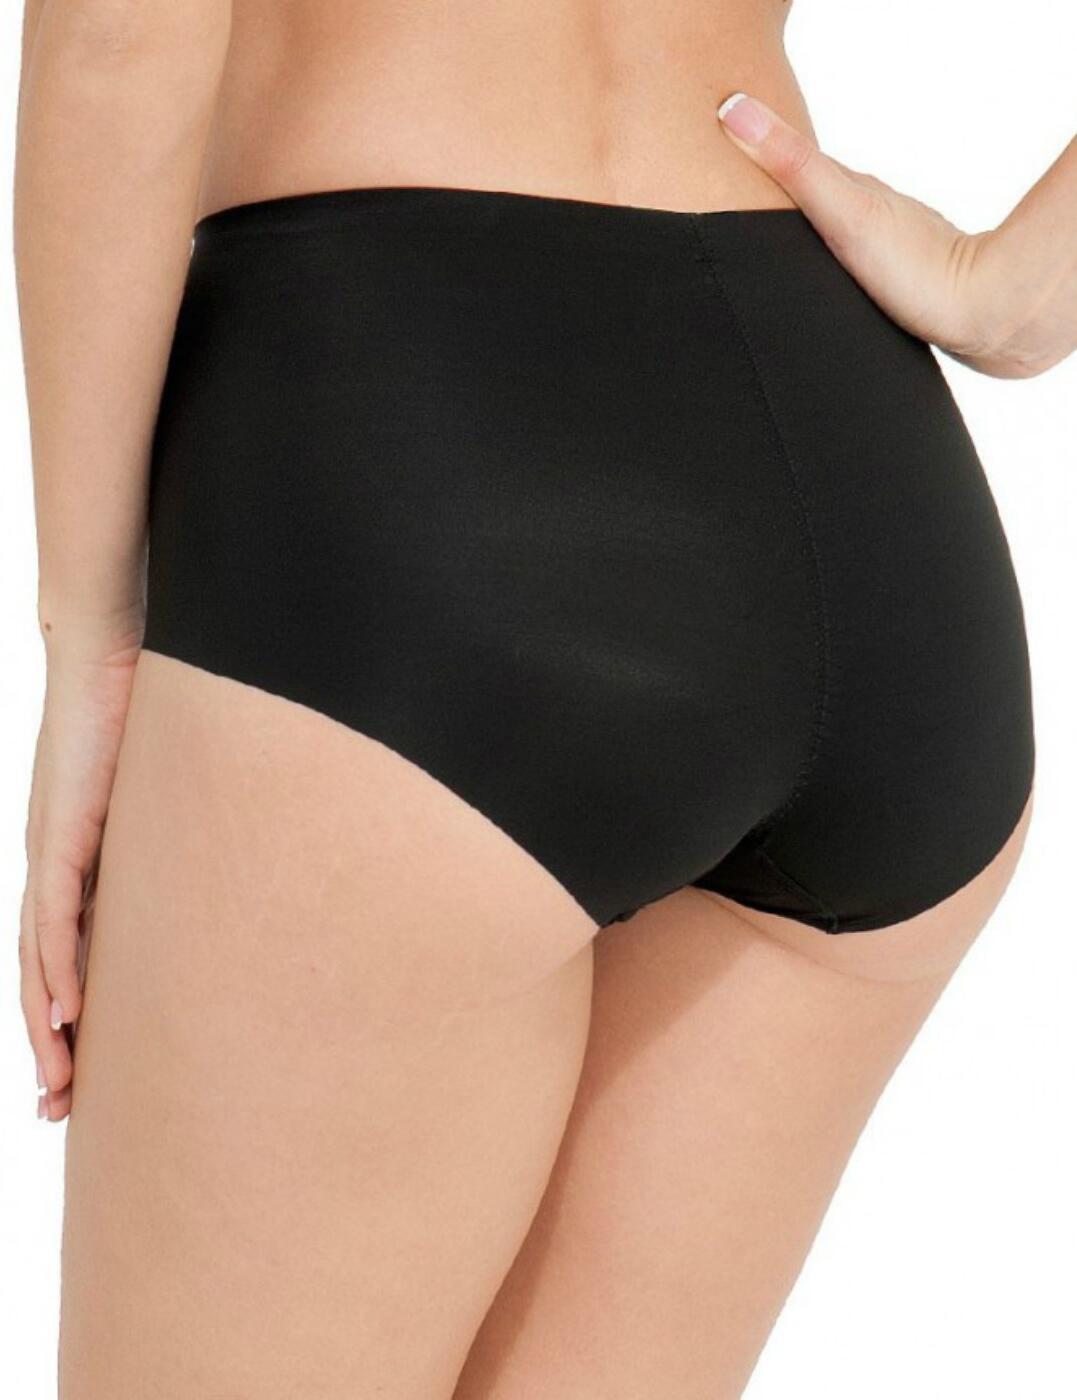 Wacoal-Beauty-Secret-Lift-Up-Shaping-Brief-Knickers-Pant-GRA441-Wacoal-Shapewear